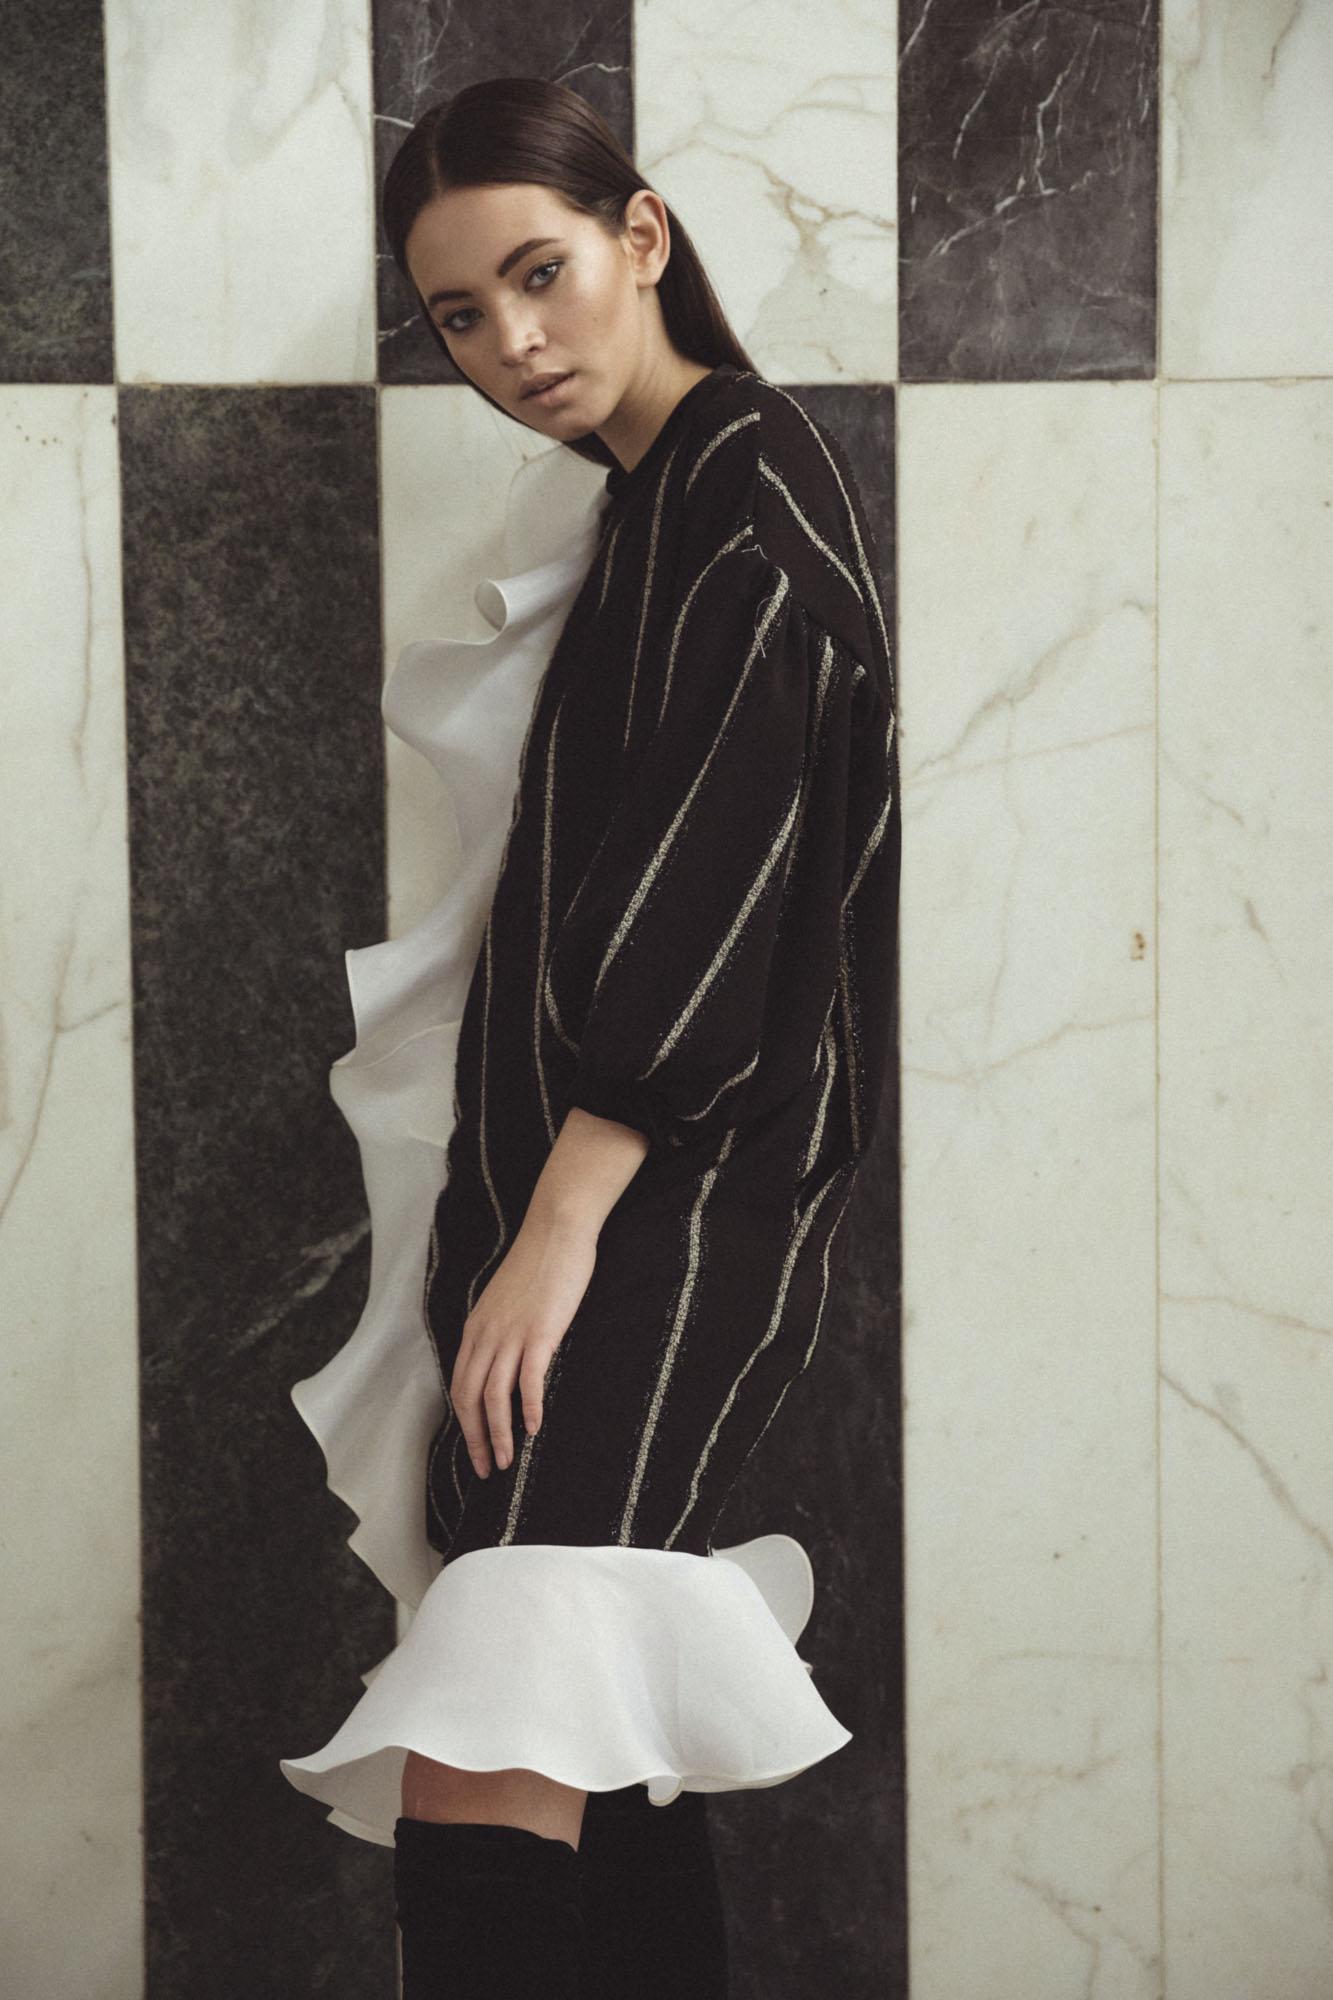 efrain_mogollon_femineus_nicole_ sweater dress3.JPG